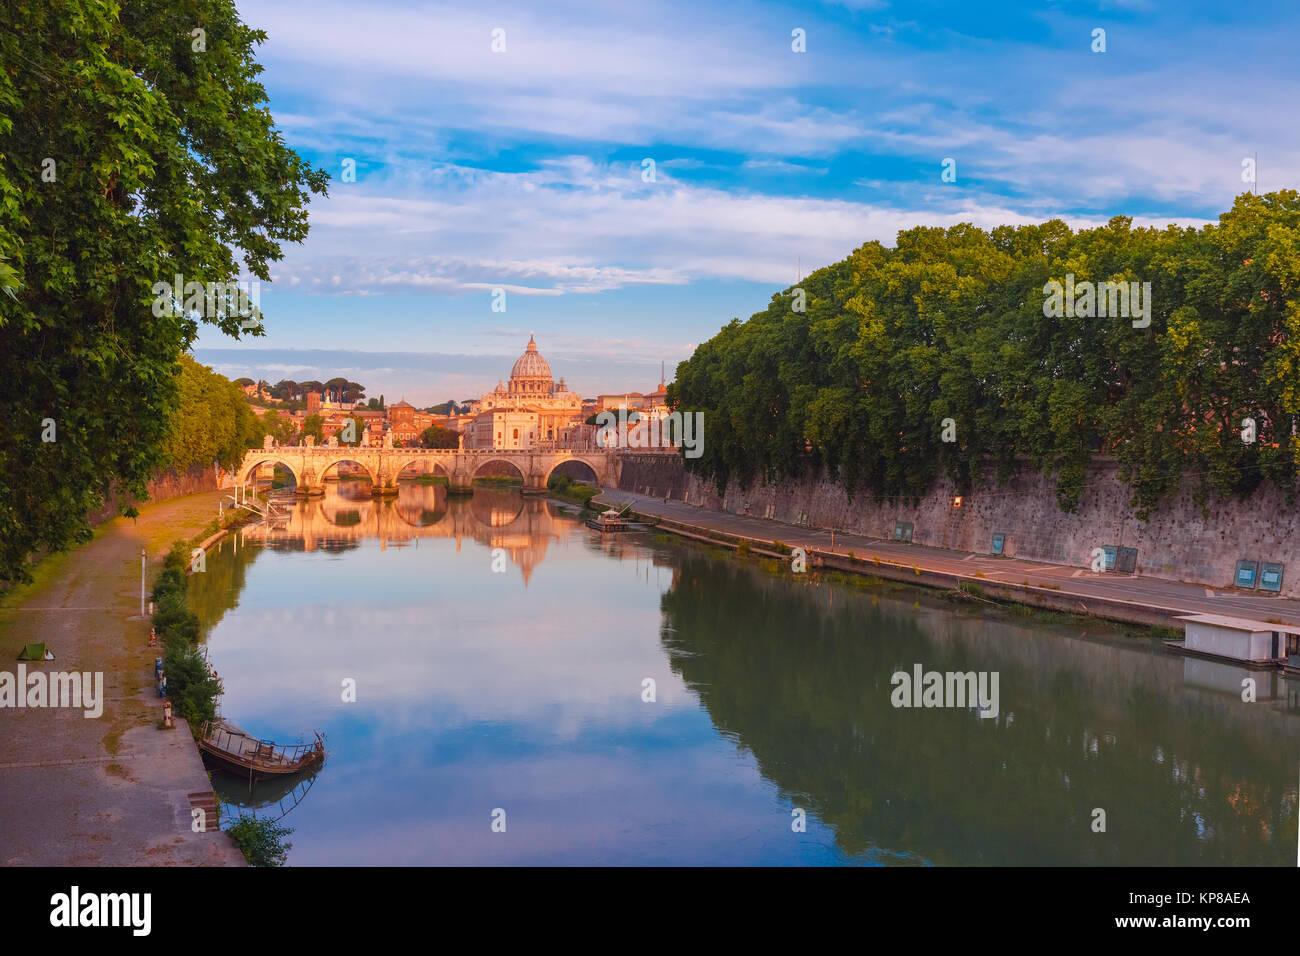 Kathedrale St. Peter in der früh, Rom, Italien. Stockfoto